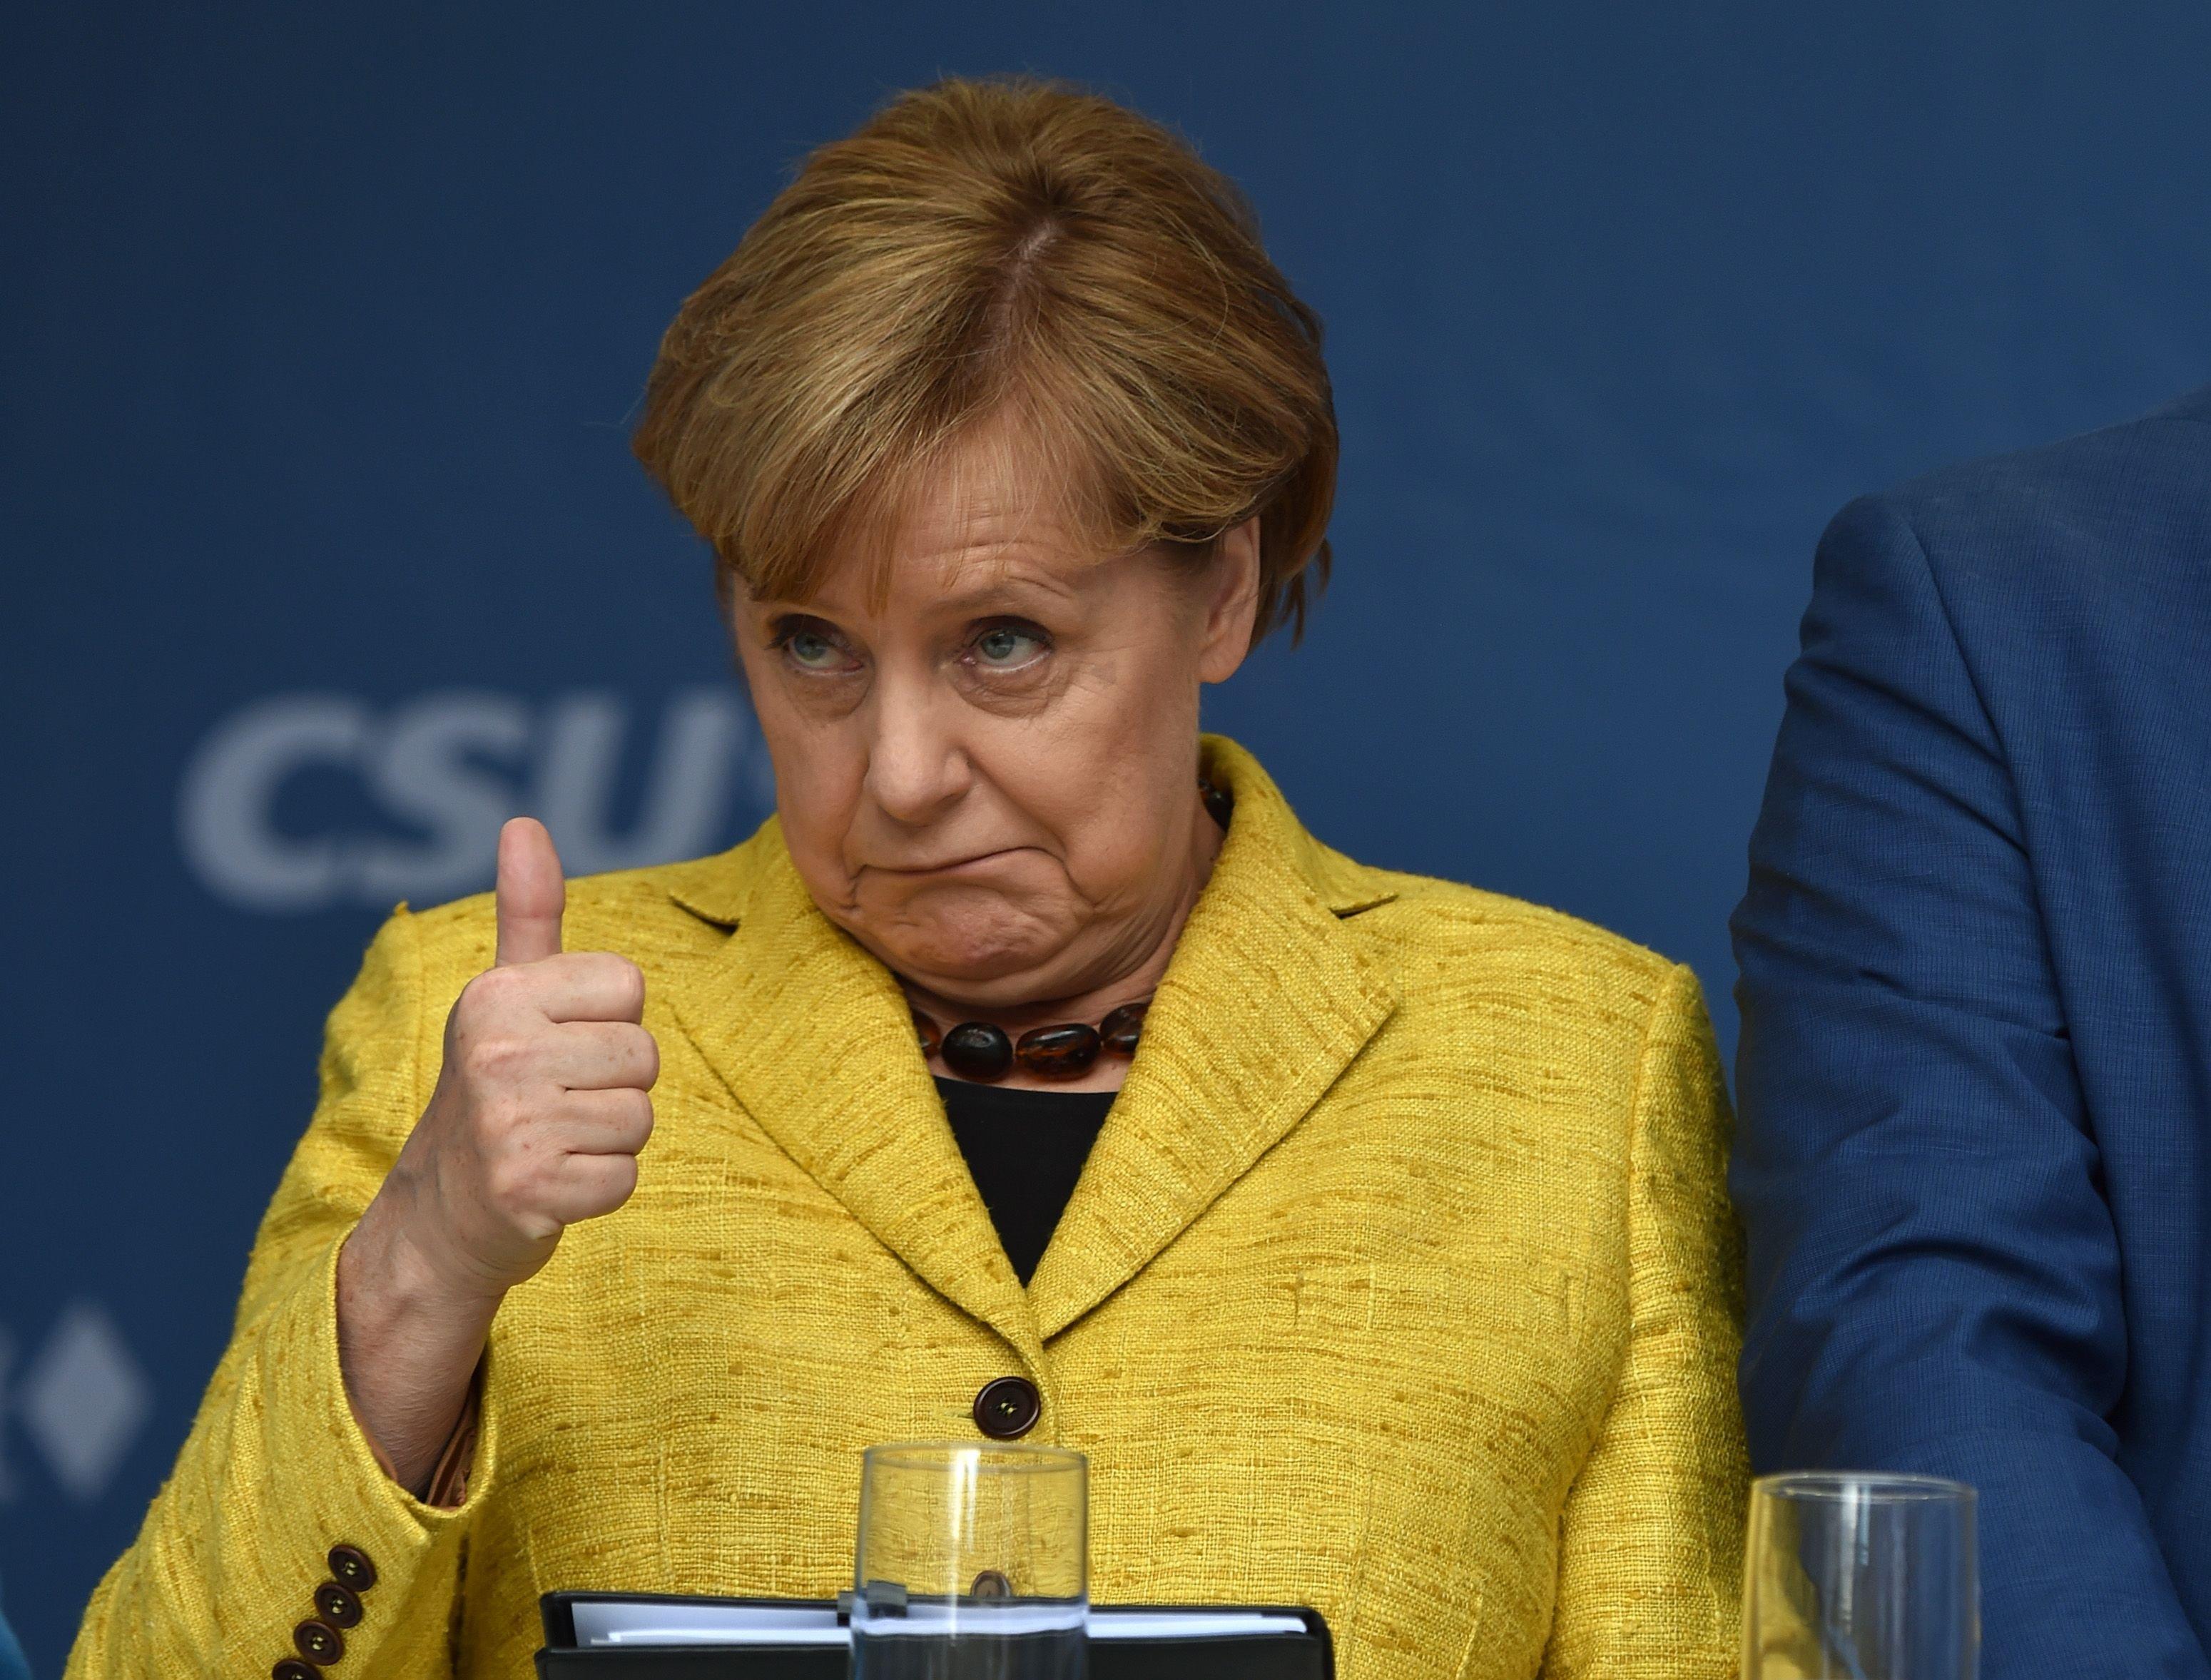 Image: Angela Merkel